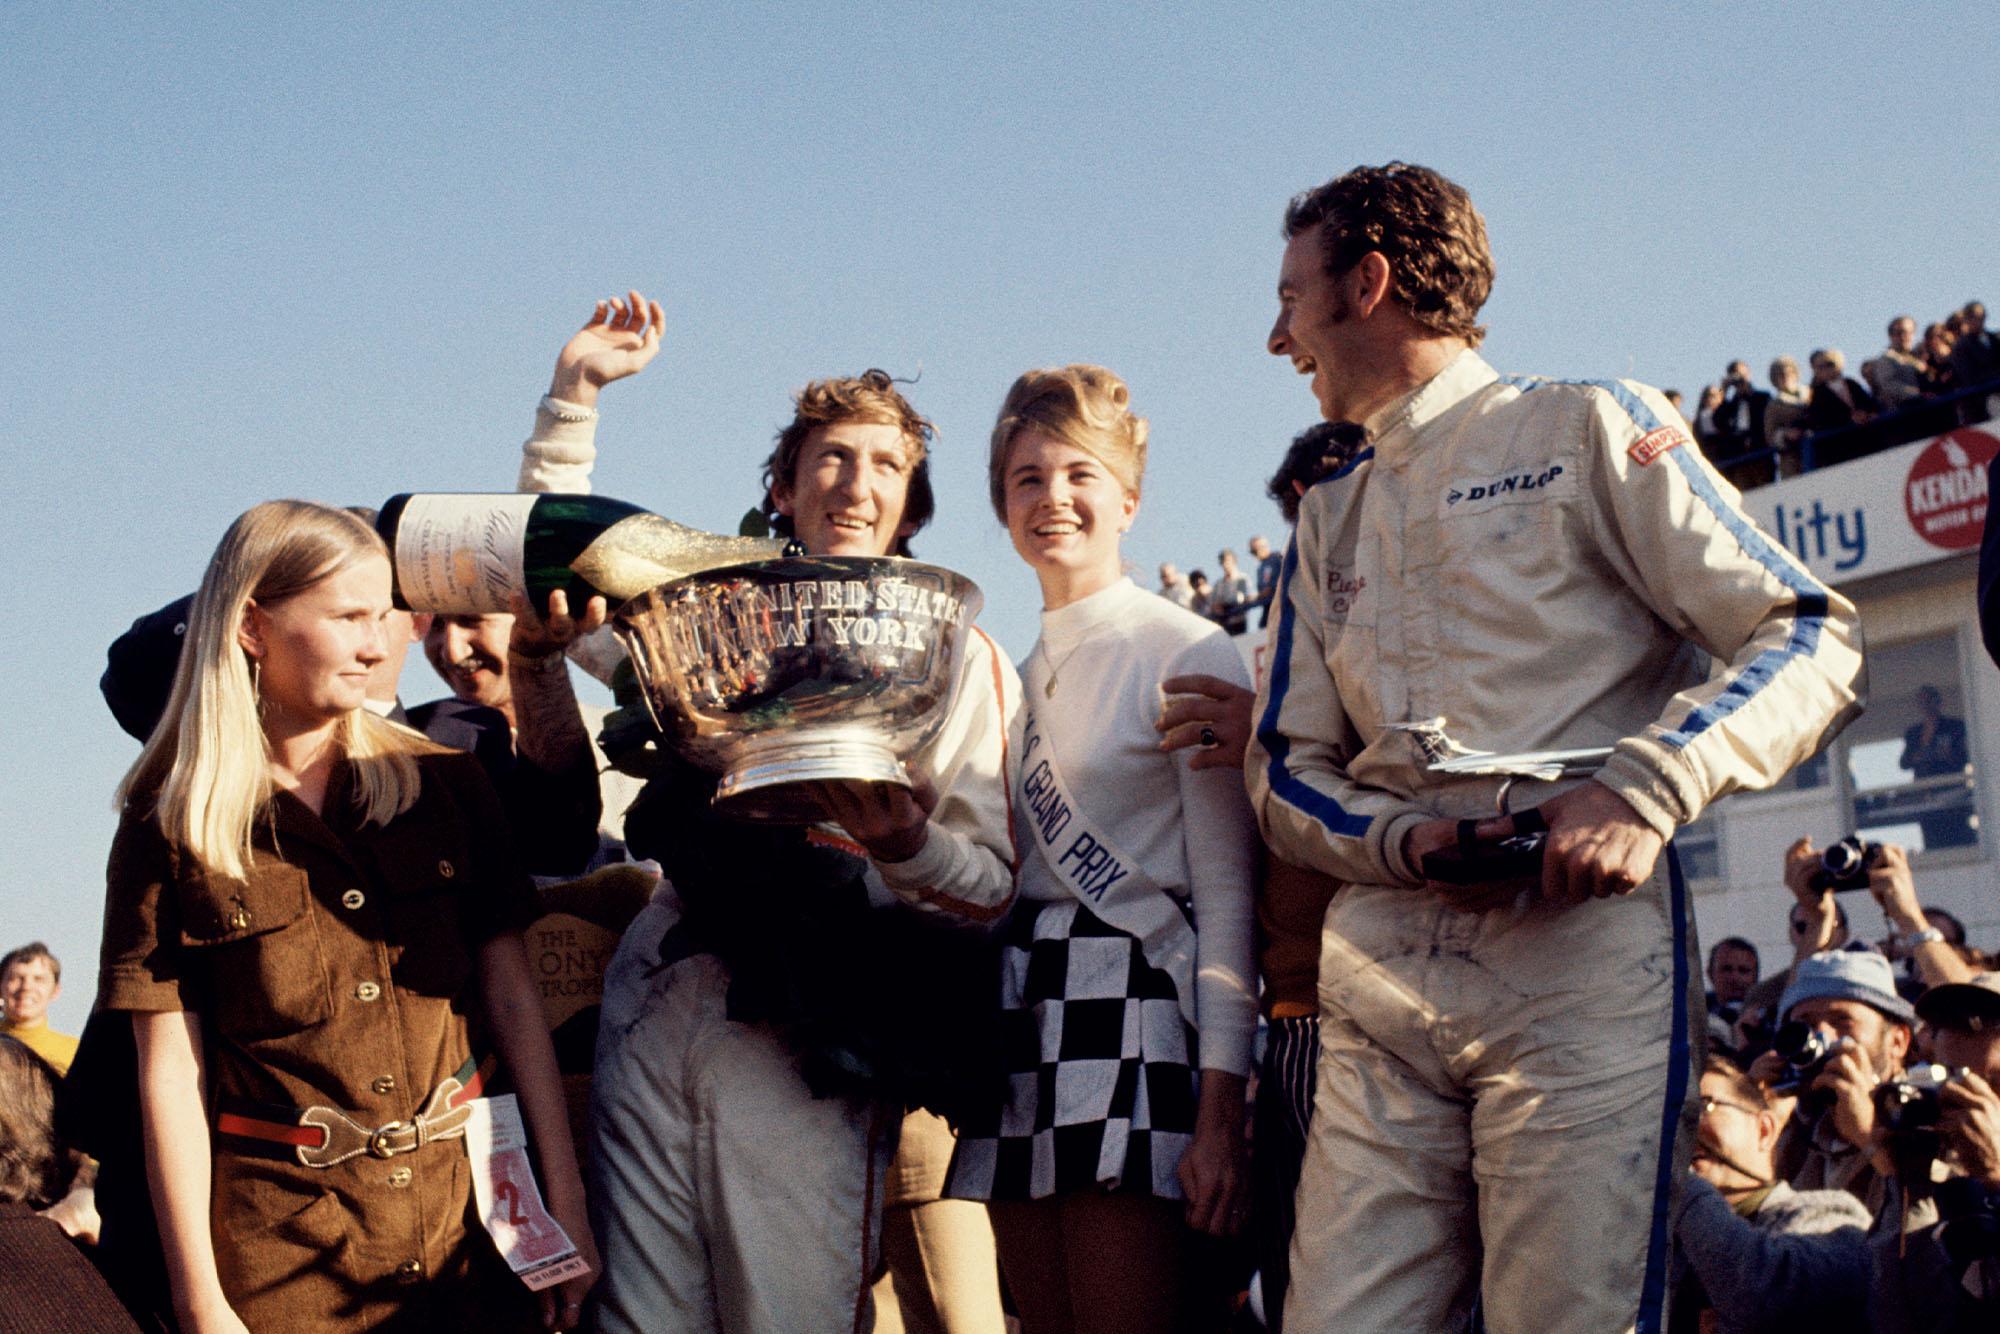 Jochen Rindt celebrates on the podium after winning the 1969 United States Grand Prix